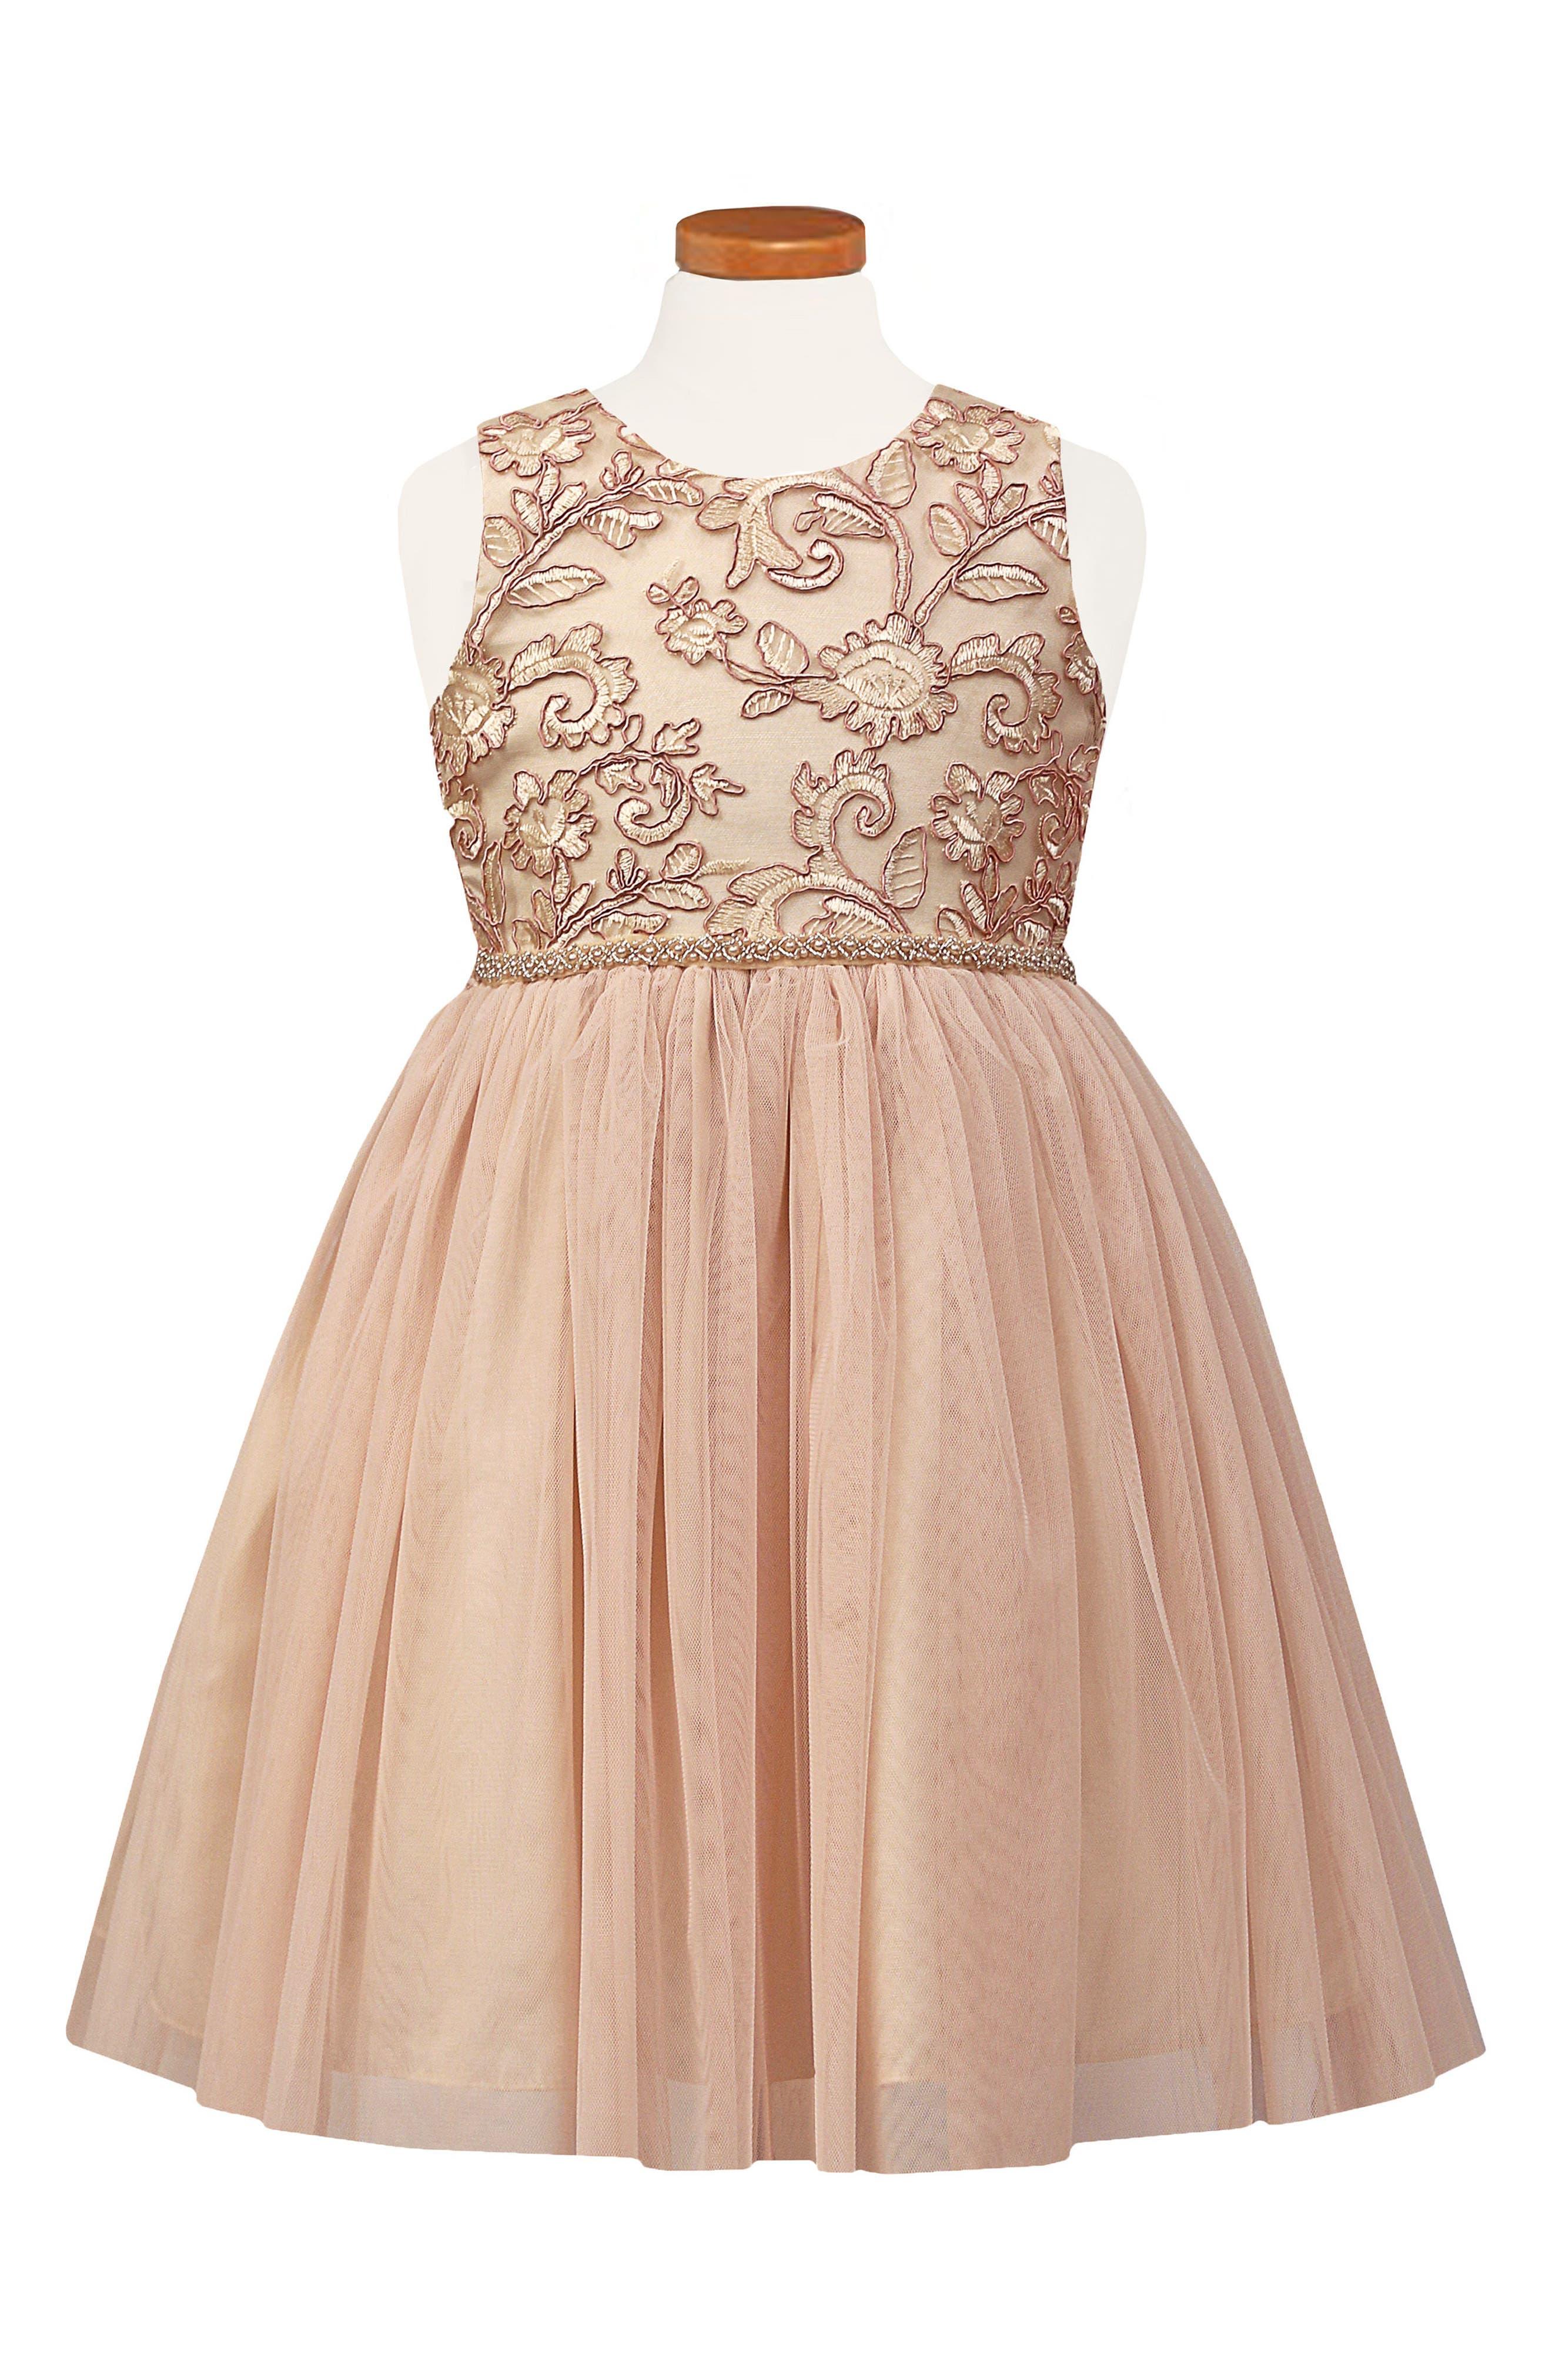 Main Image - Sorbet Embroidered Tulle Dress (Toddler Girls & Little Girls)